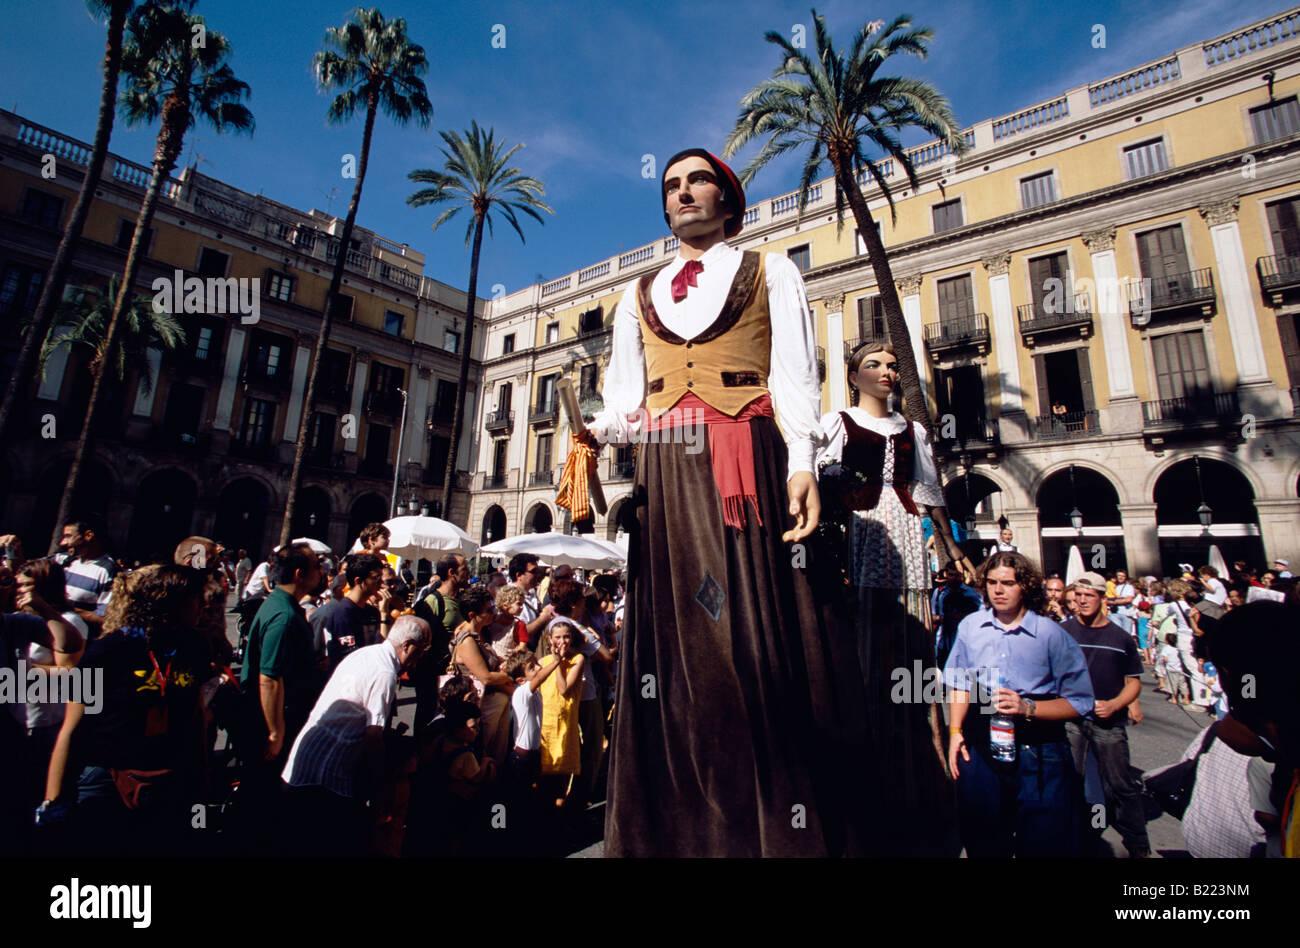 Gegantes 5m Giants Parade at Placa Reial Festa de la Merce Barcelona Catalonia Spain Stock Photo